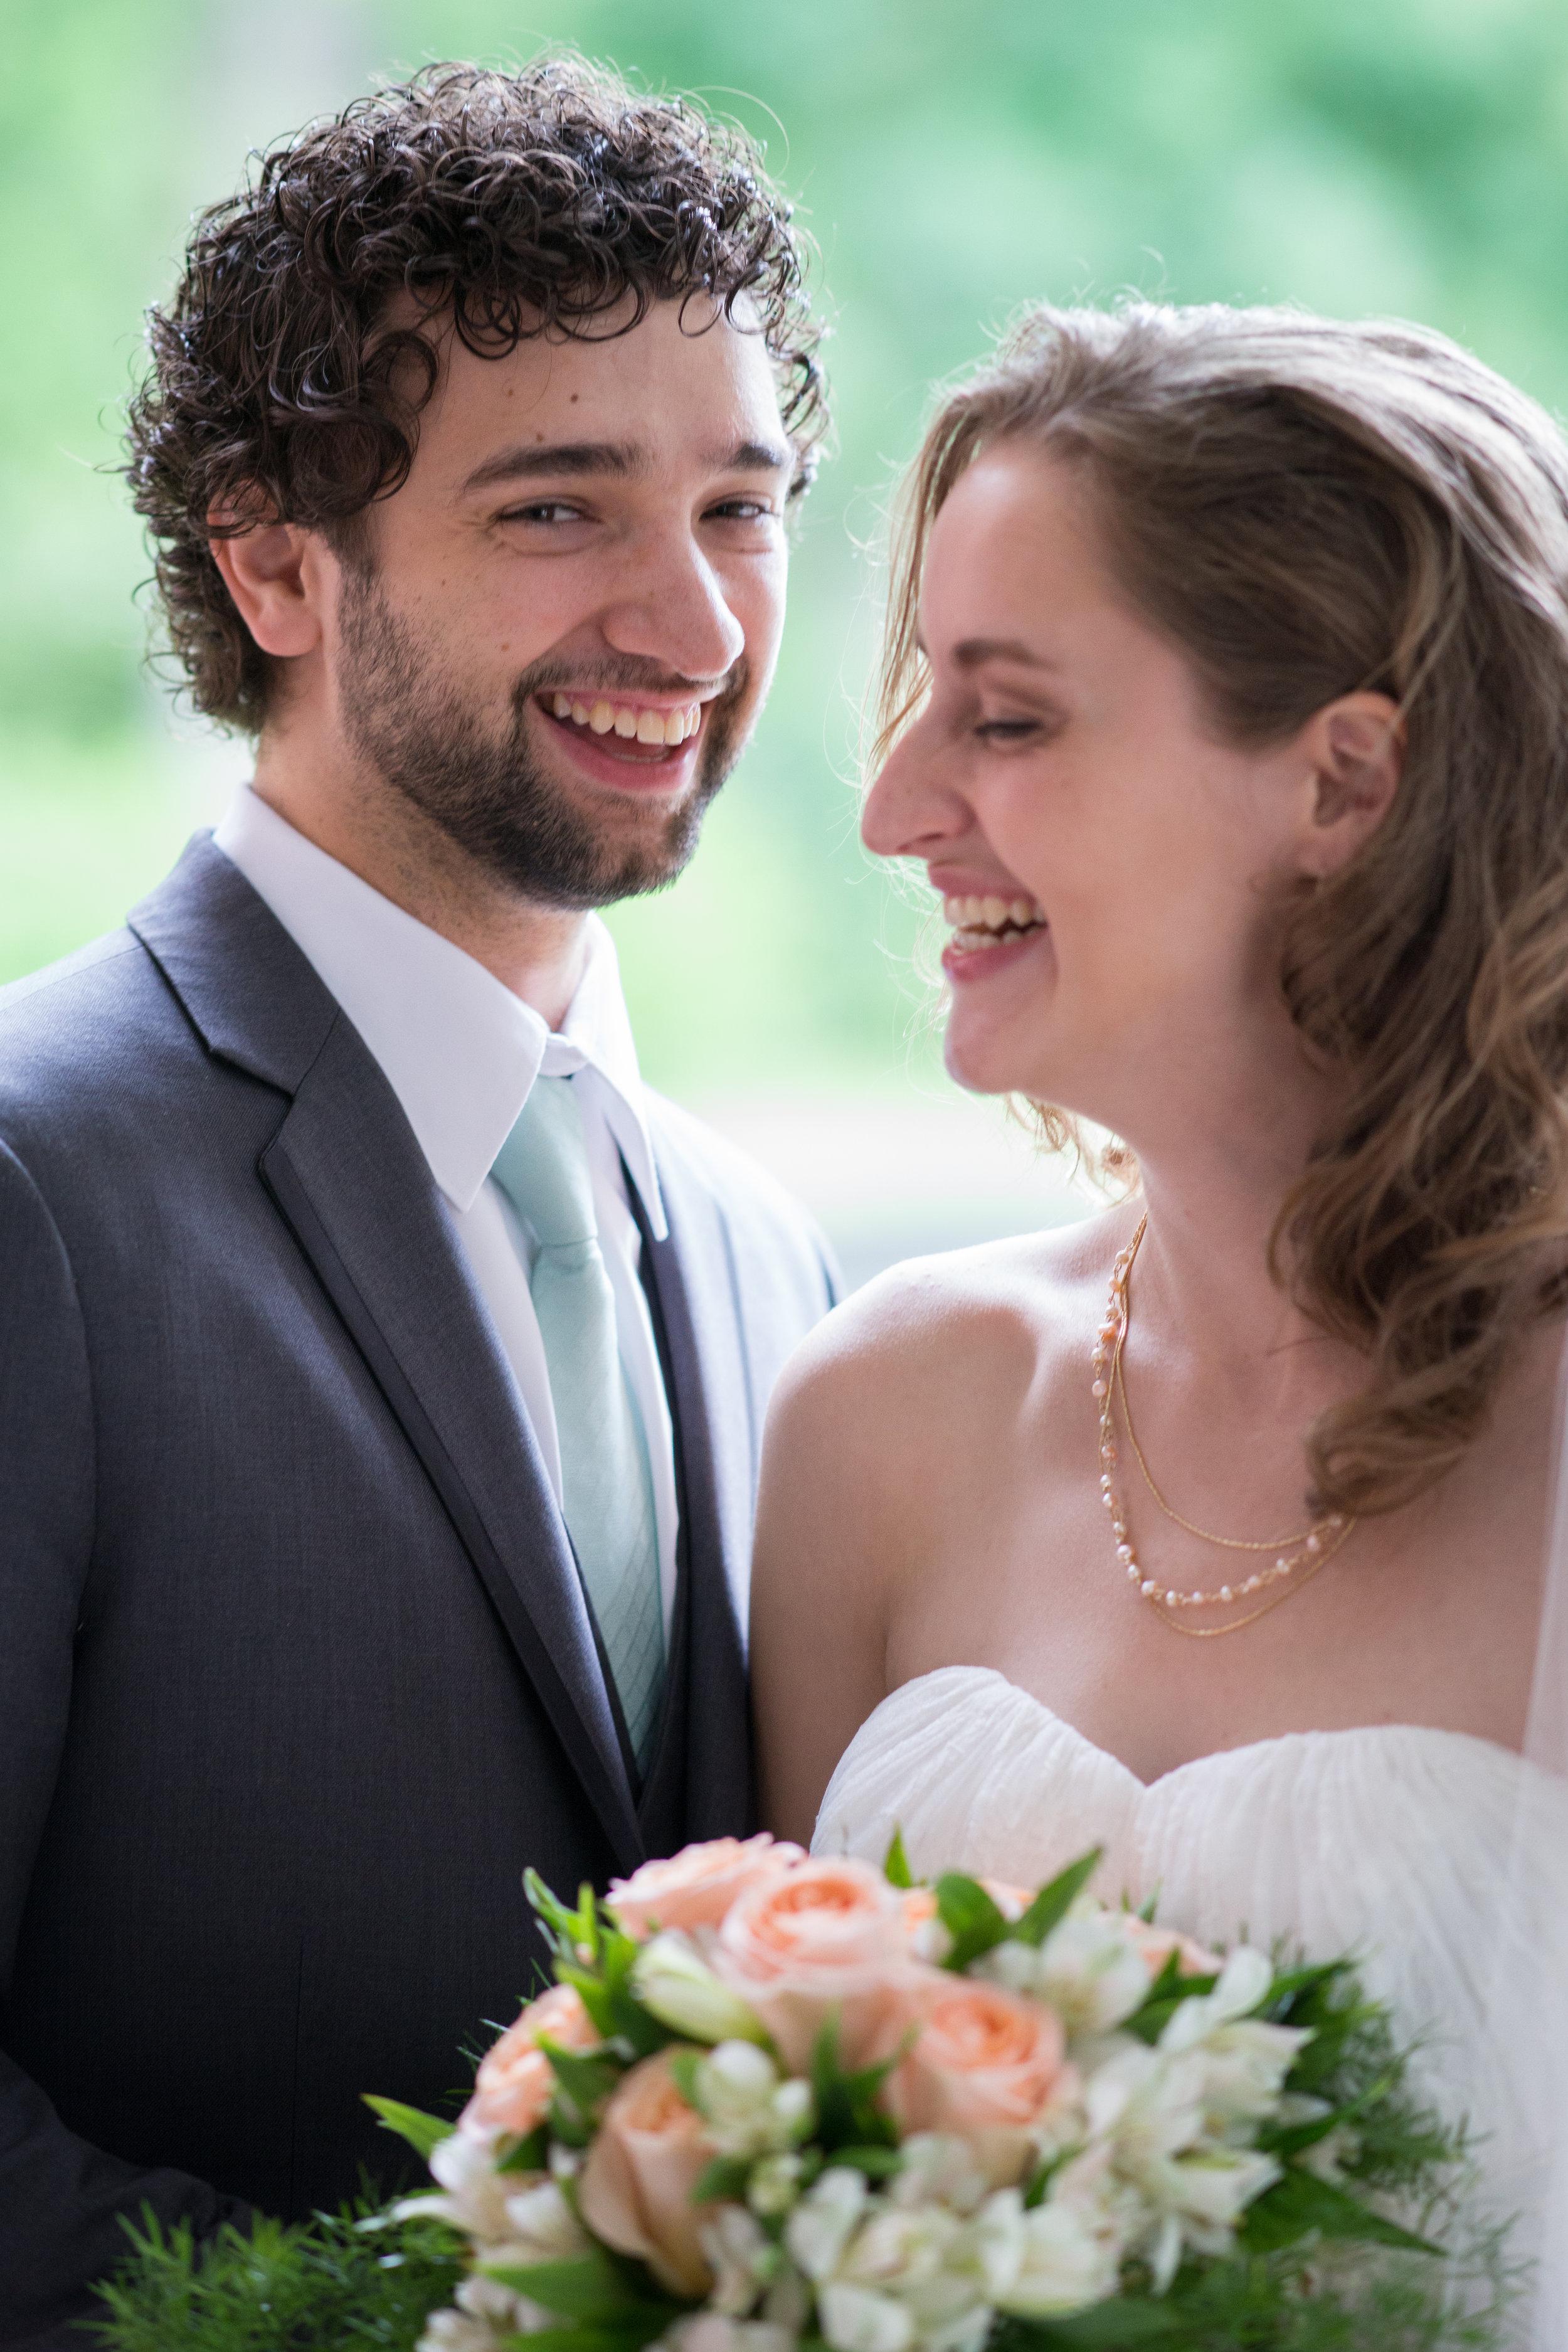 Sean & Melissa 026 - DSC06682.jpg